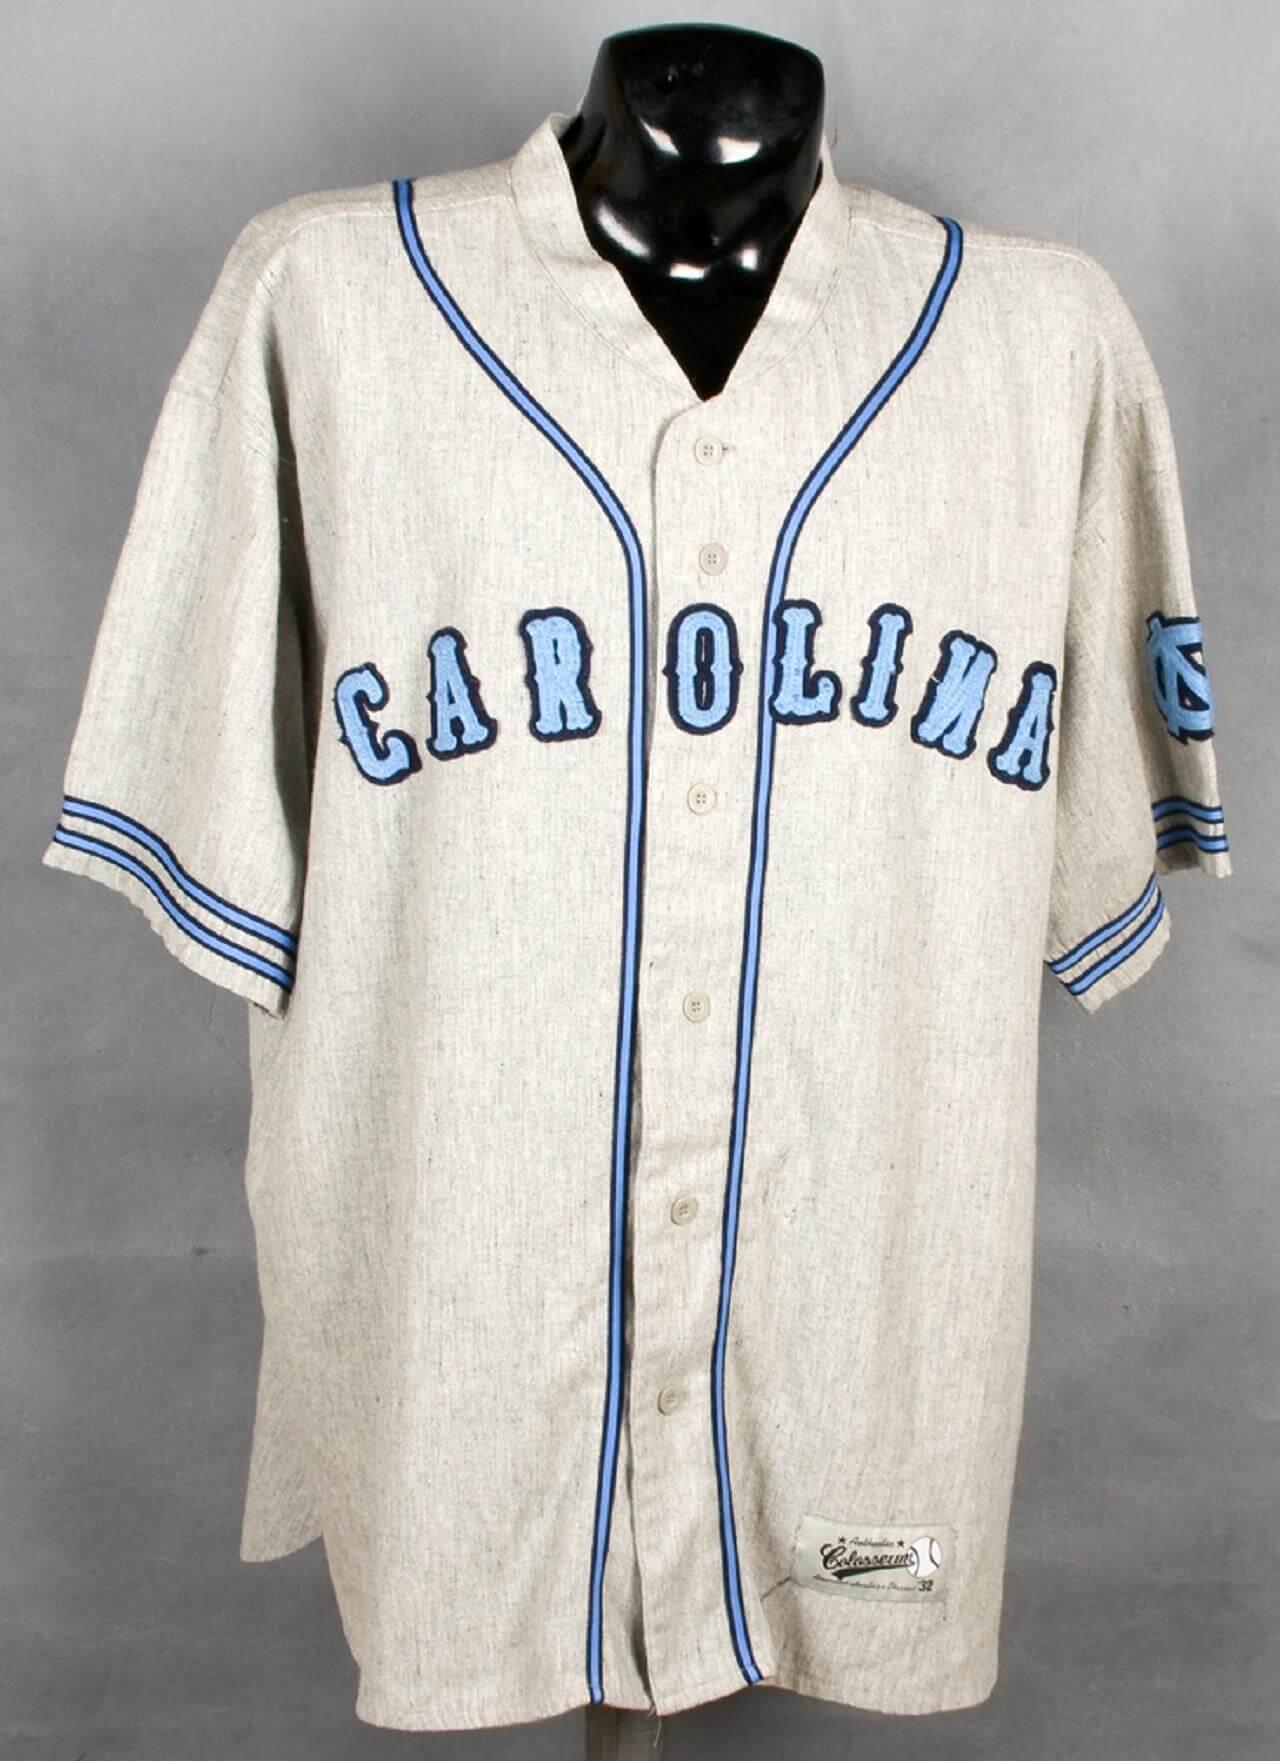 UNC Flannel Replica Baseball Jersey (1932 Style)60411_01_lg